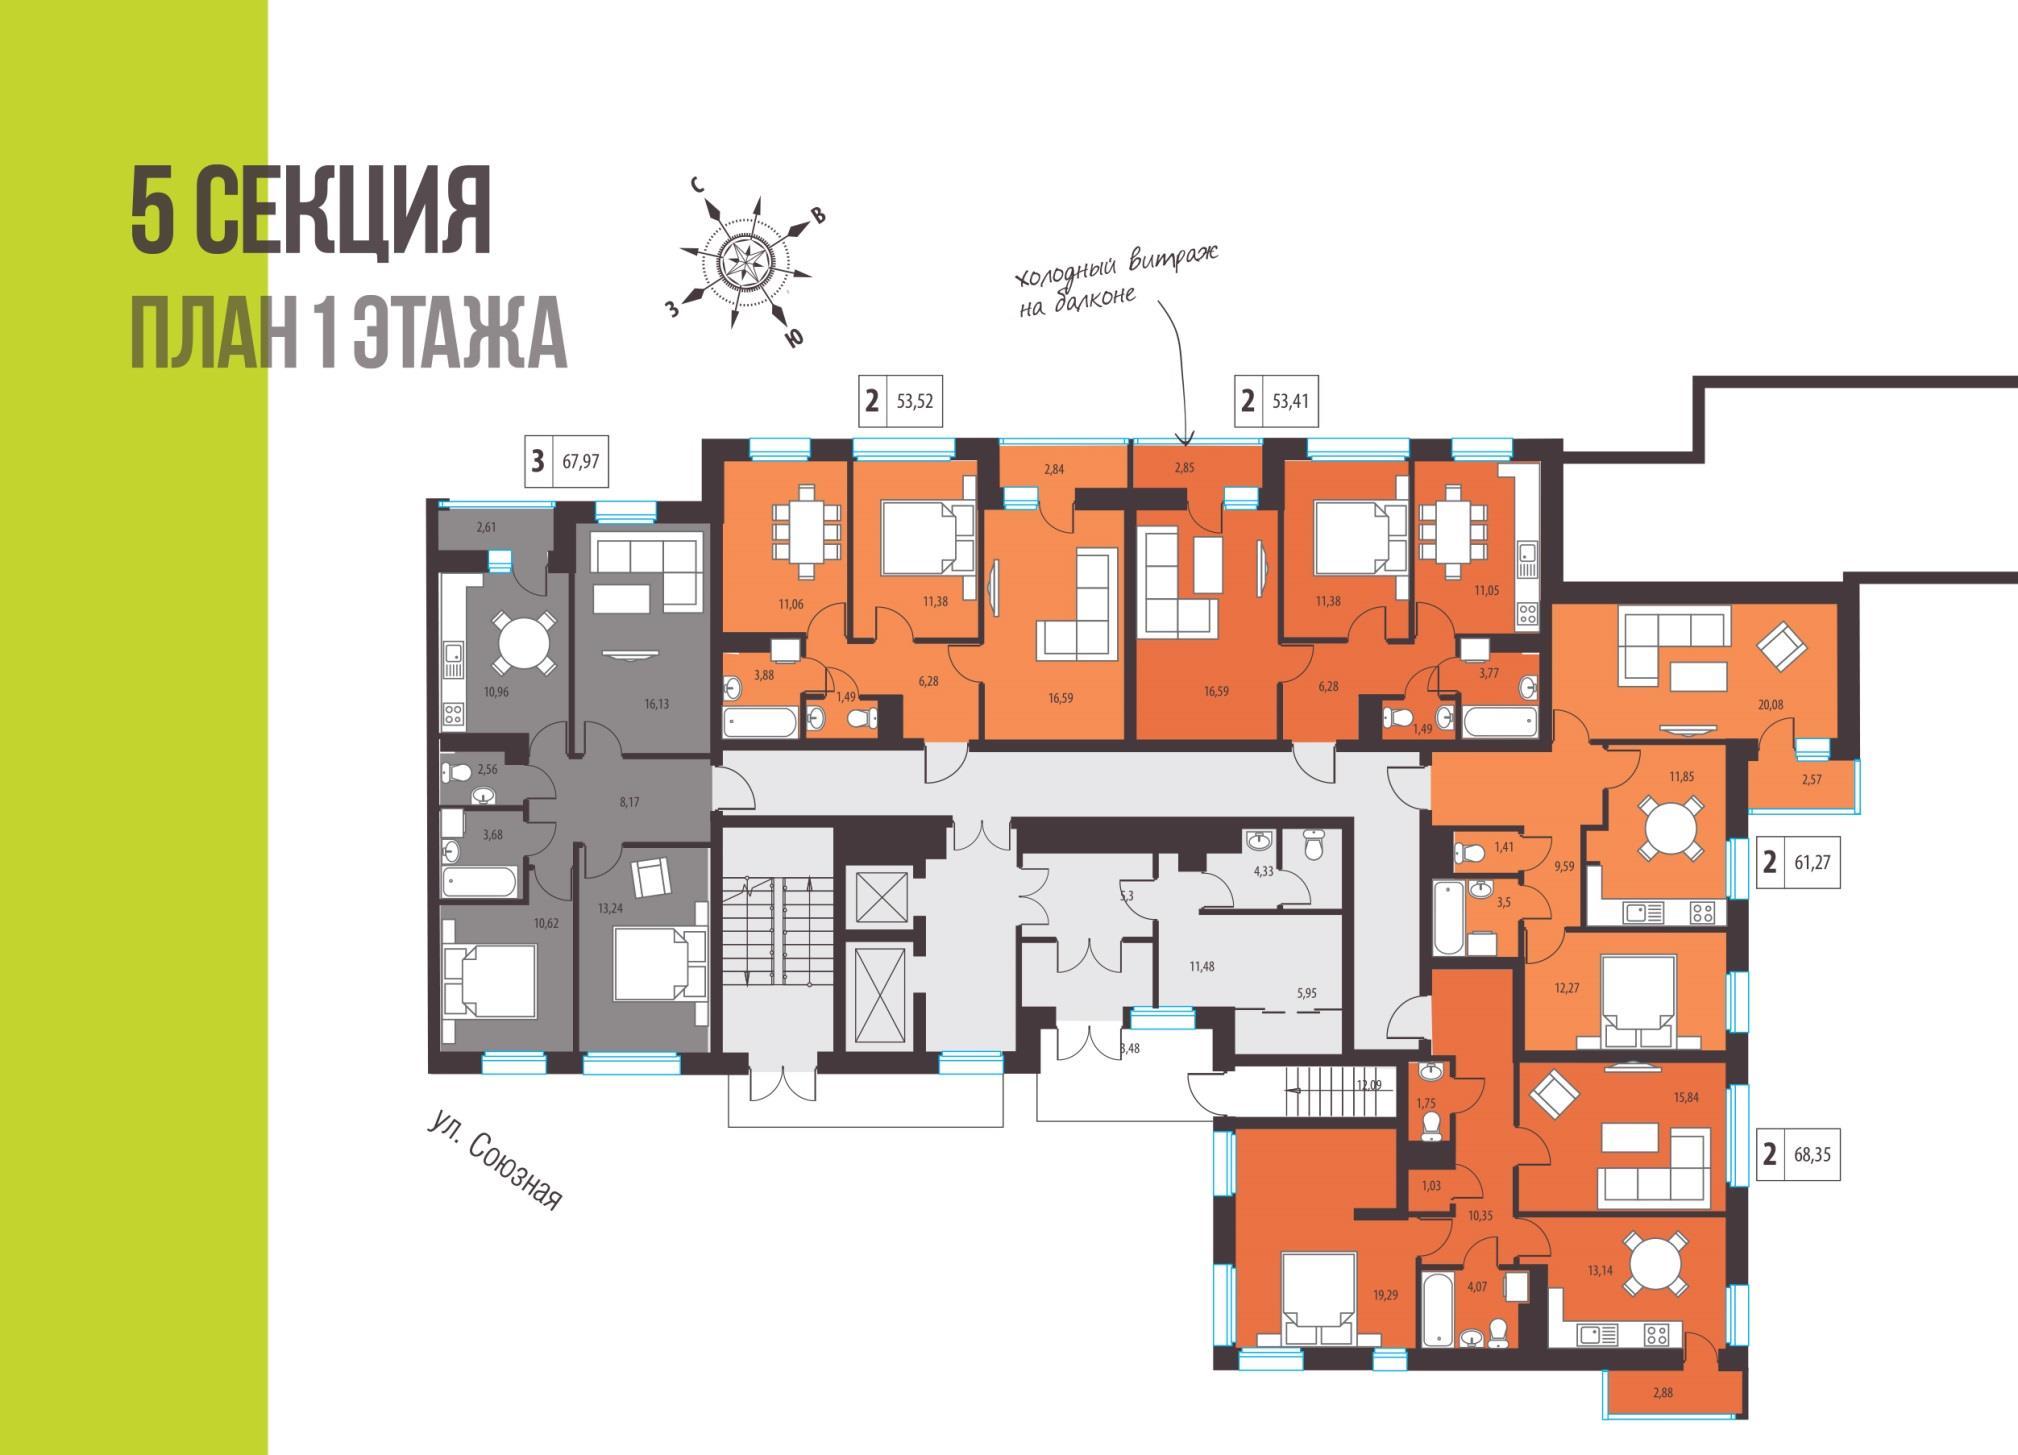 5я секция. план 1го этажа